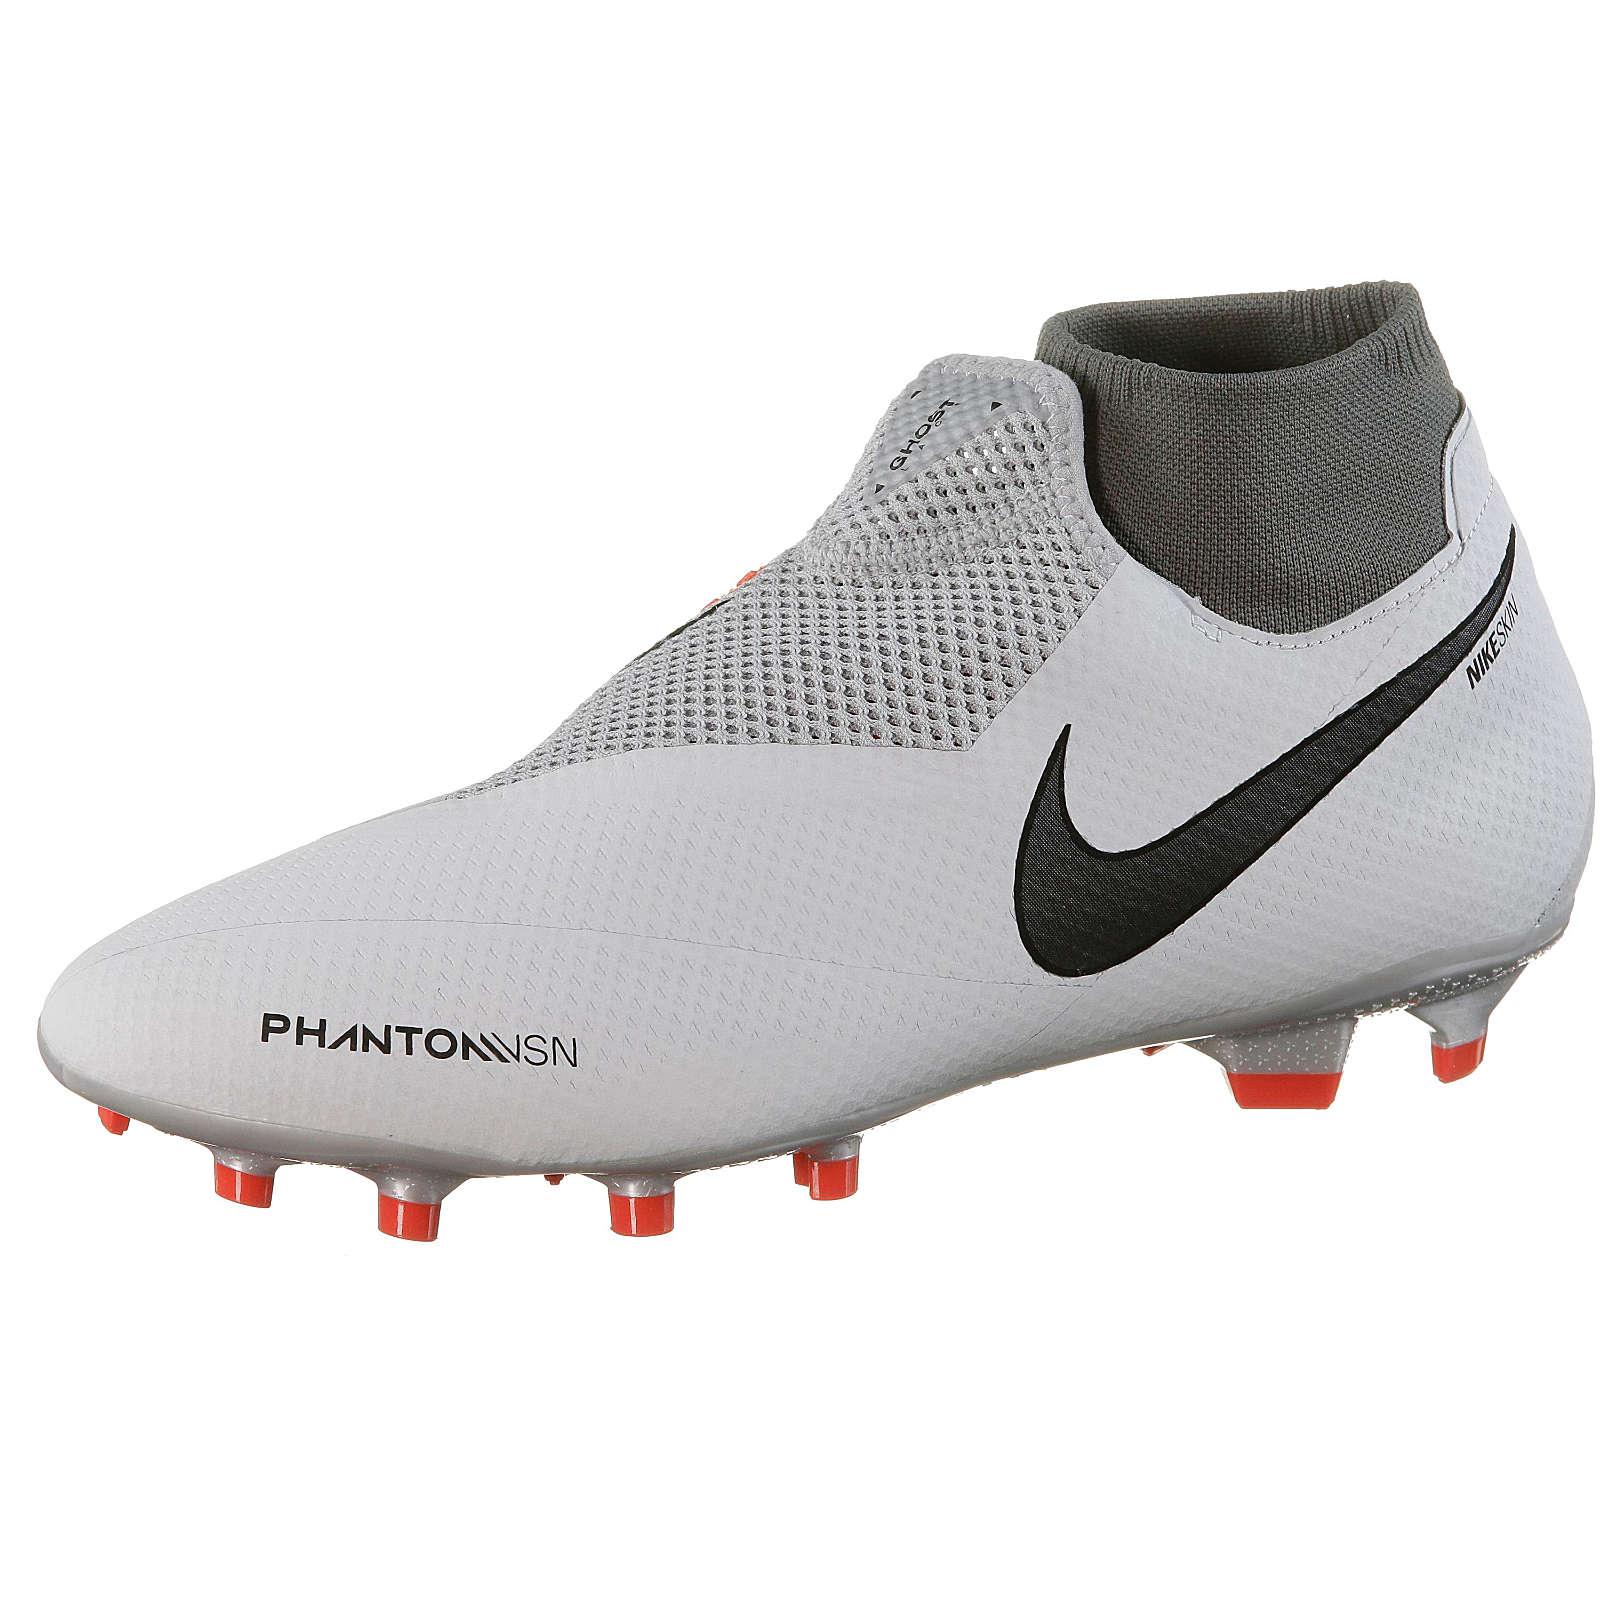 Nike Performance Fußballschuhe Phantom VSN PRO DF FG Fußballschuhe grau Damen Gr. 39